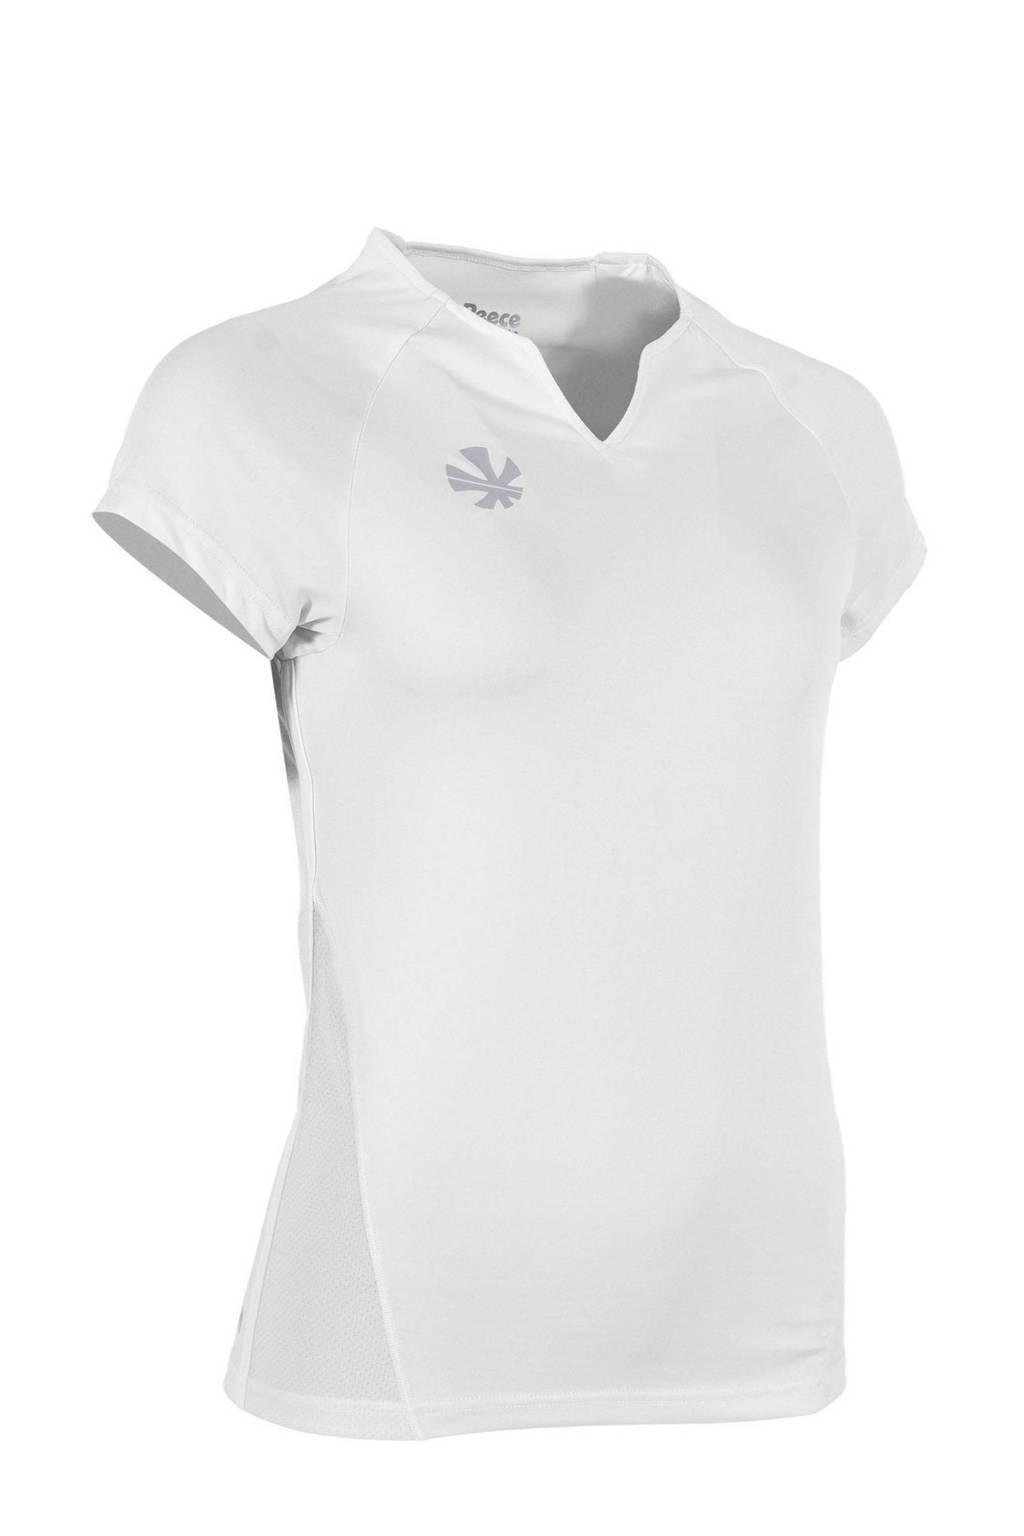 Reece Australia sport T-shirt Rise wit, Wit